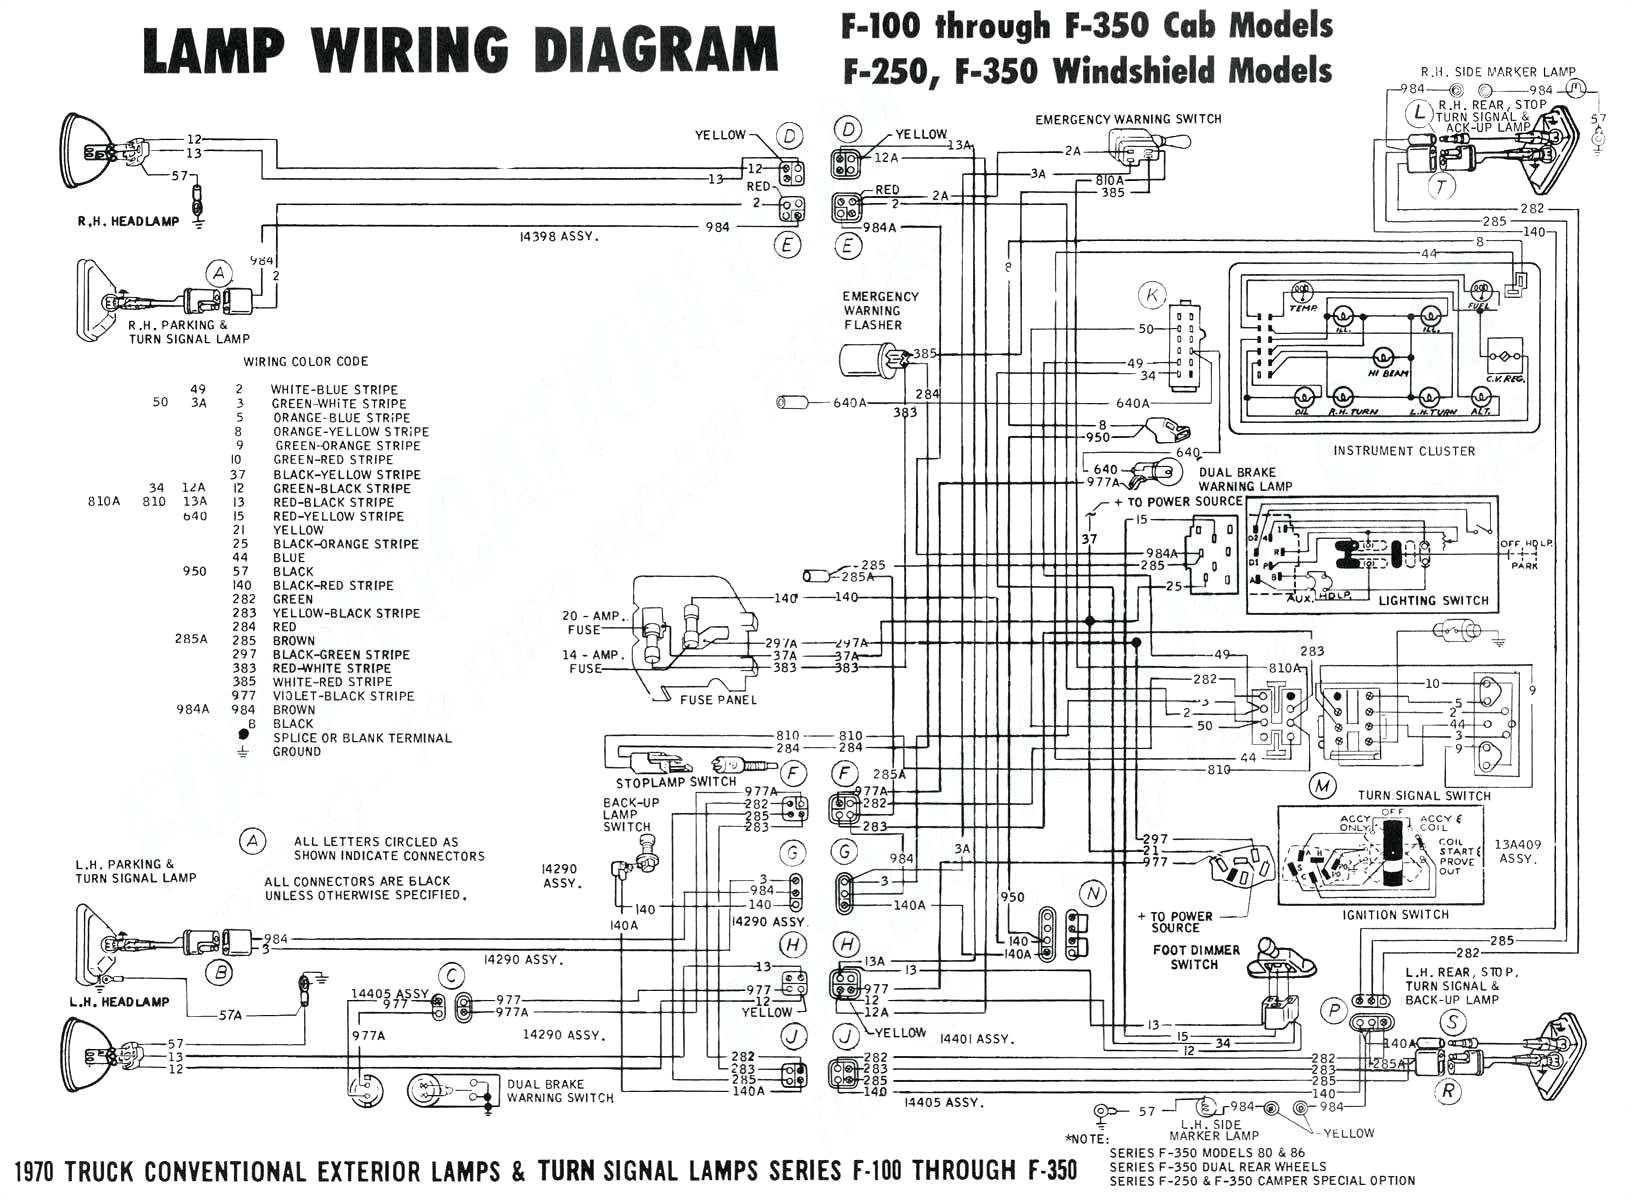 Ford Ranger Wire Diagram ford Ranger Light Wiring Diagram Wiring Diagram Database